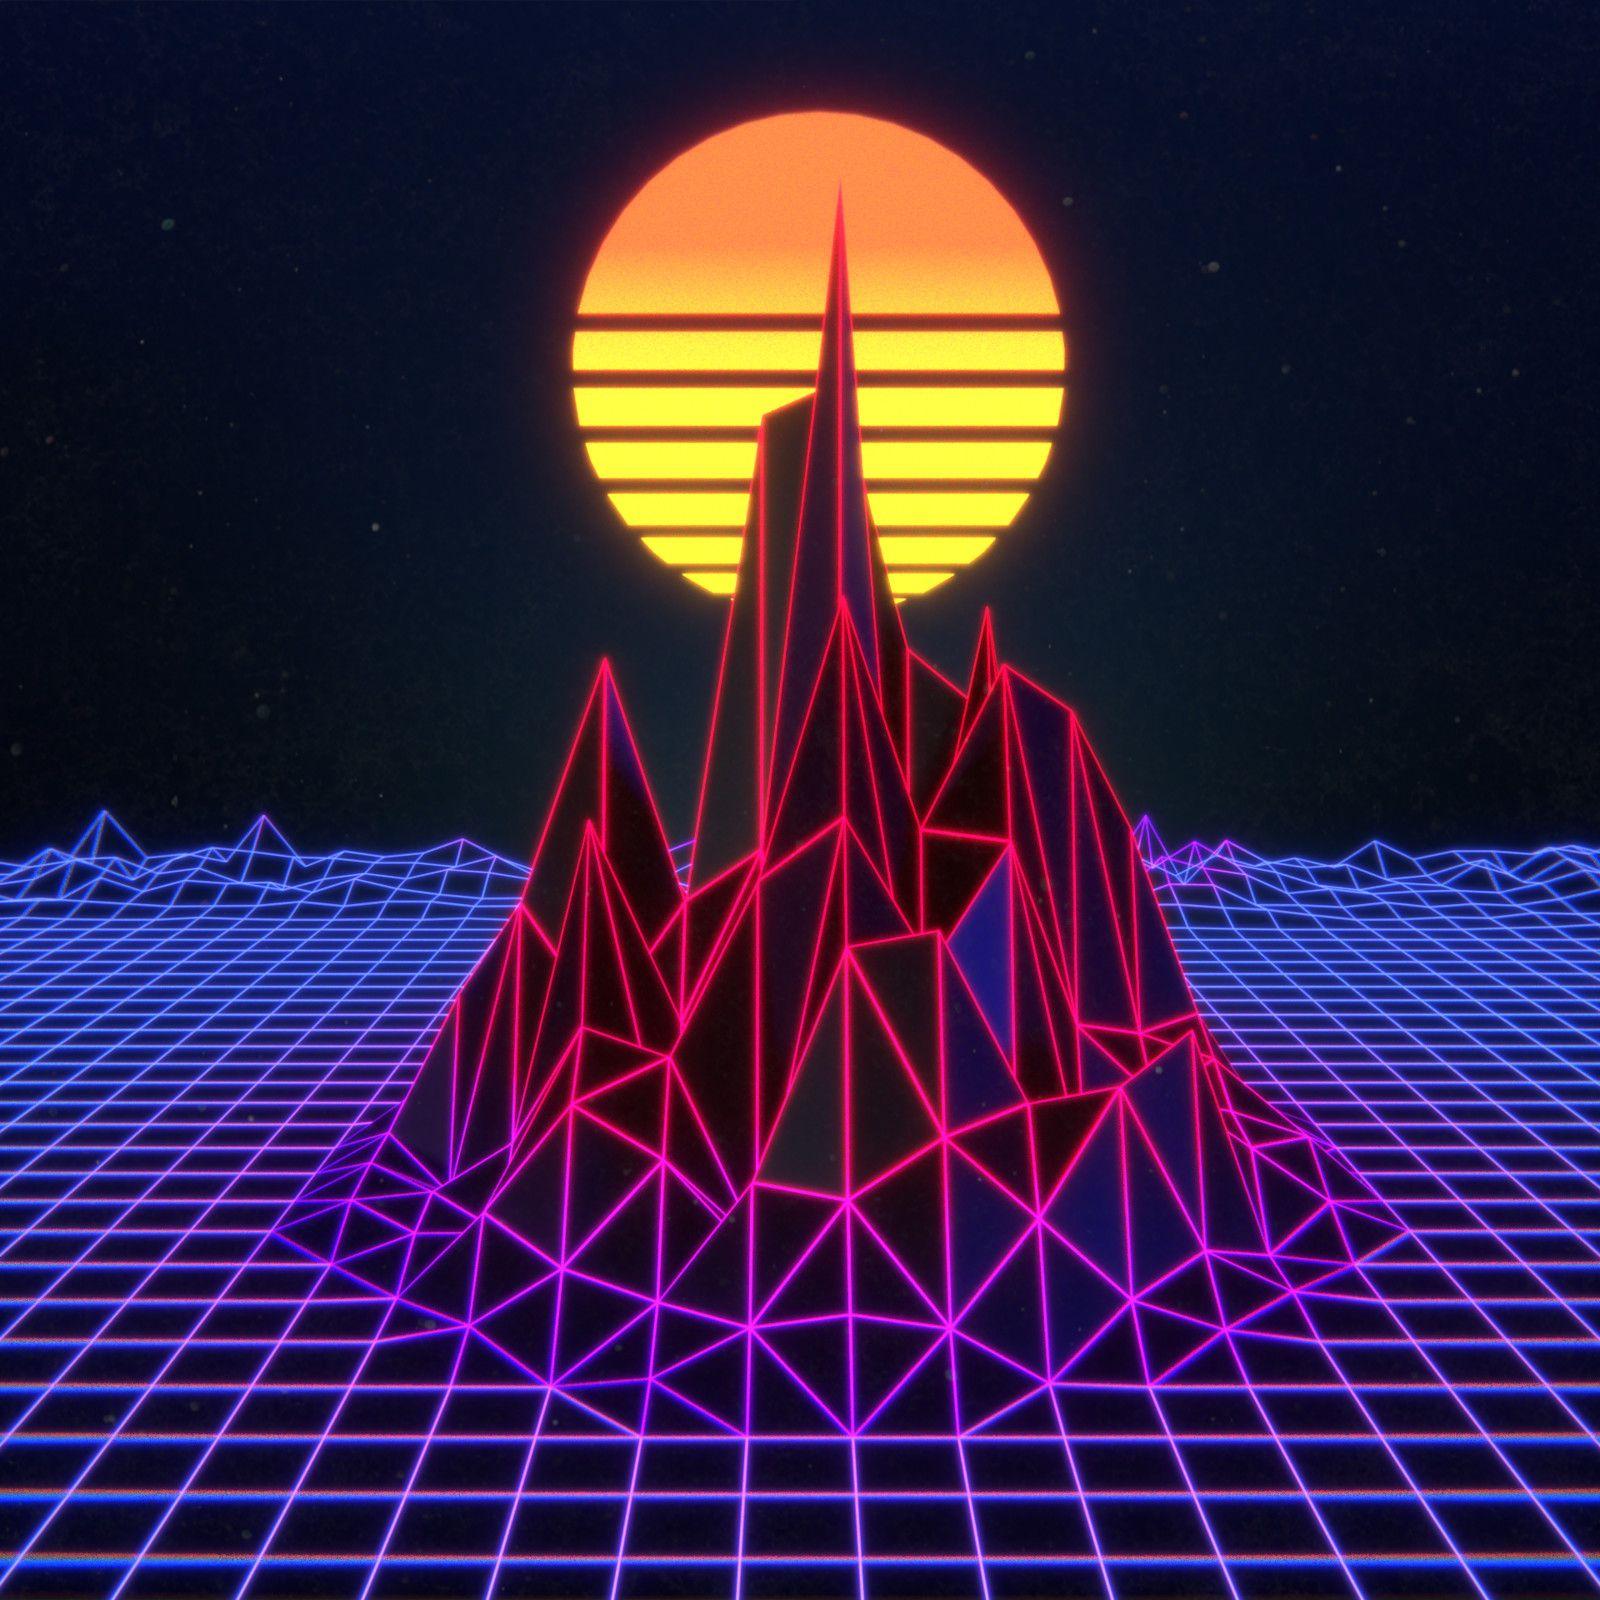 Synthwave Mountain, Ashley Arter on ArtStation at https